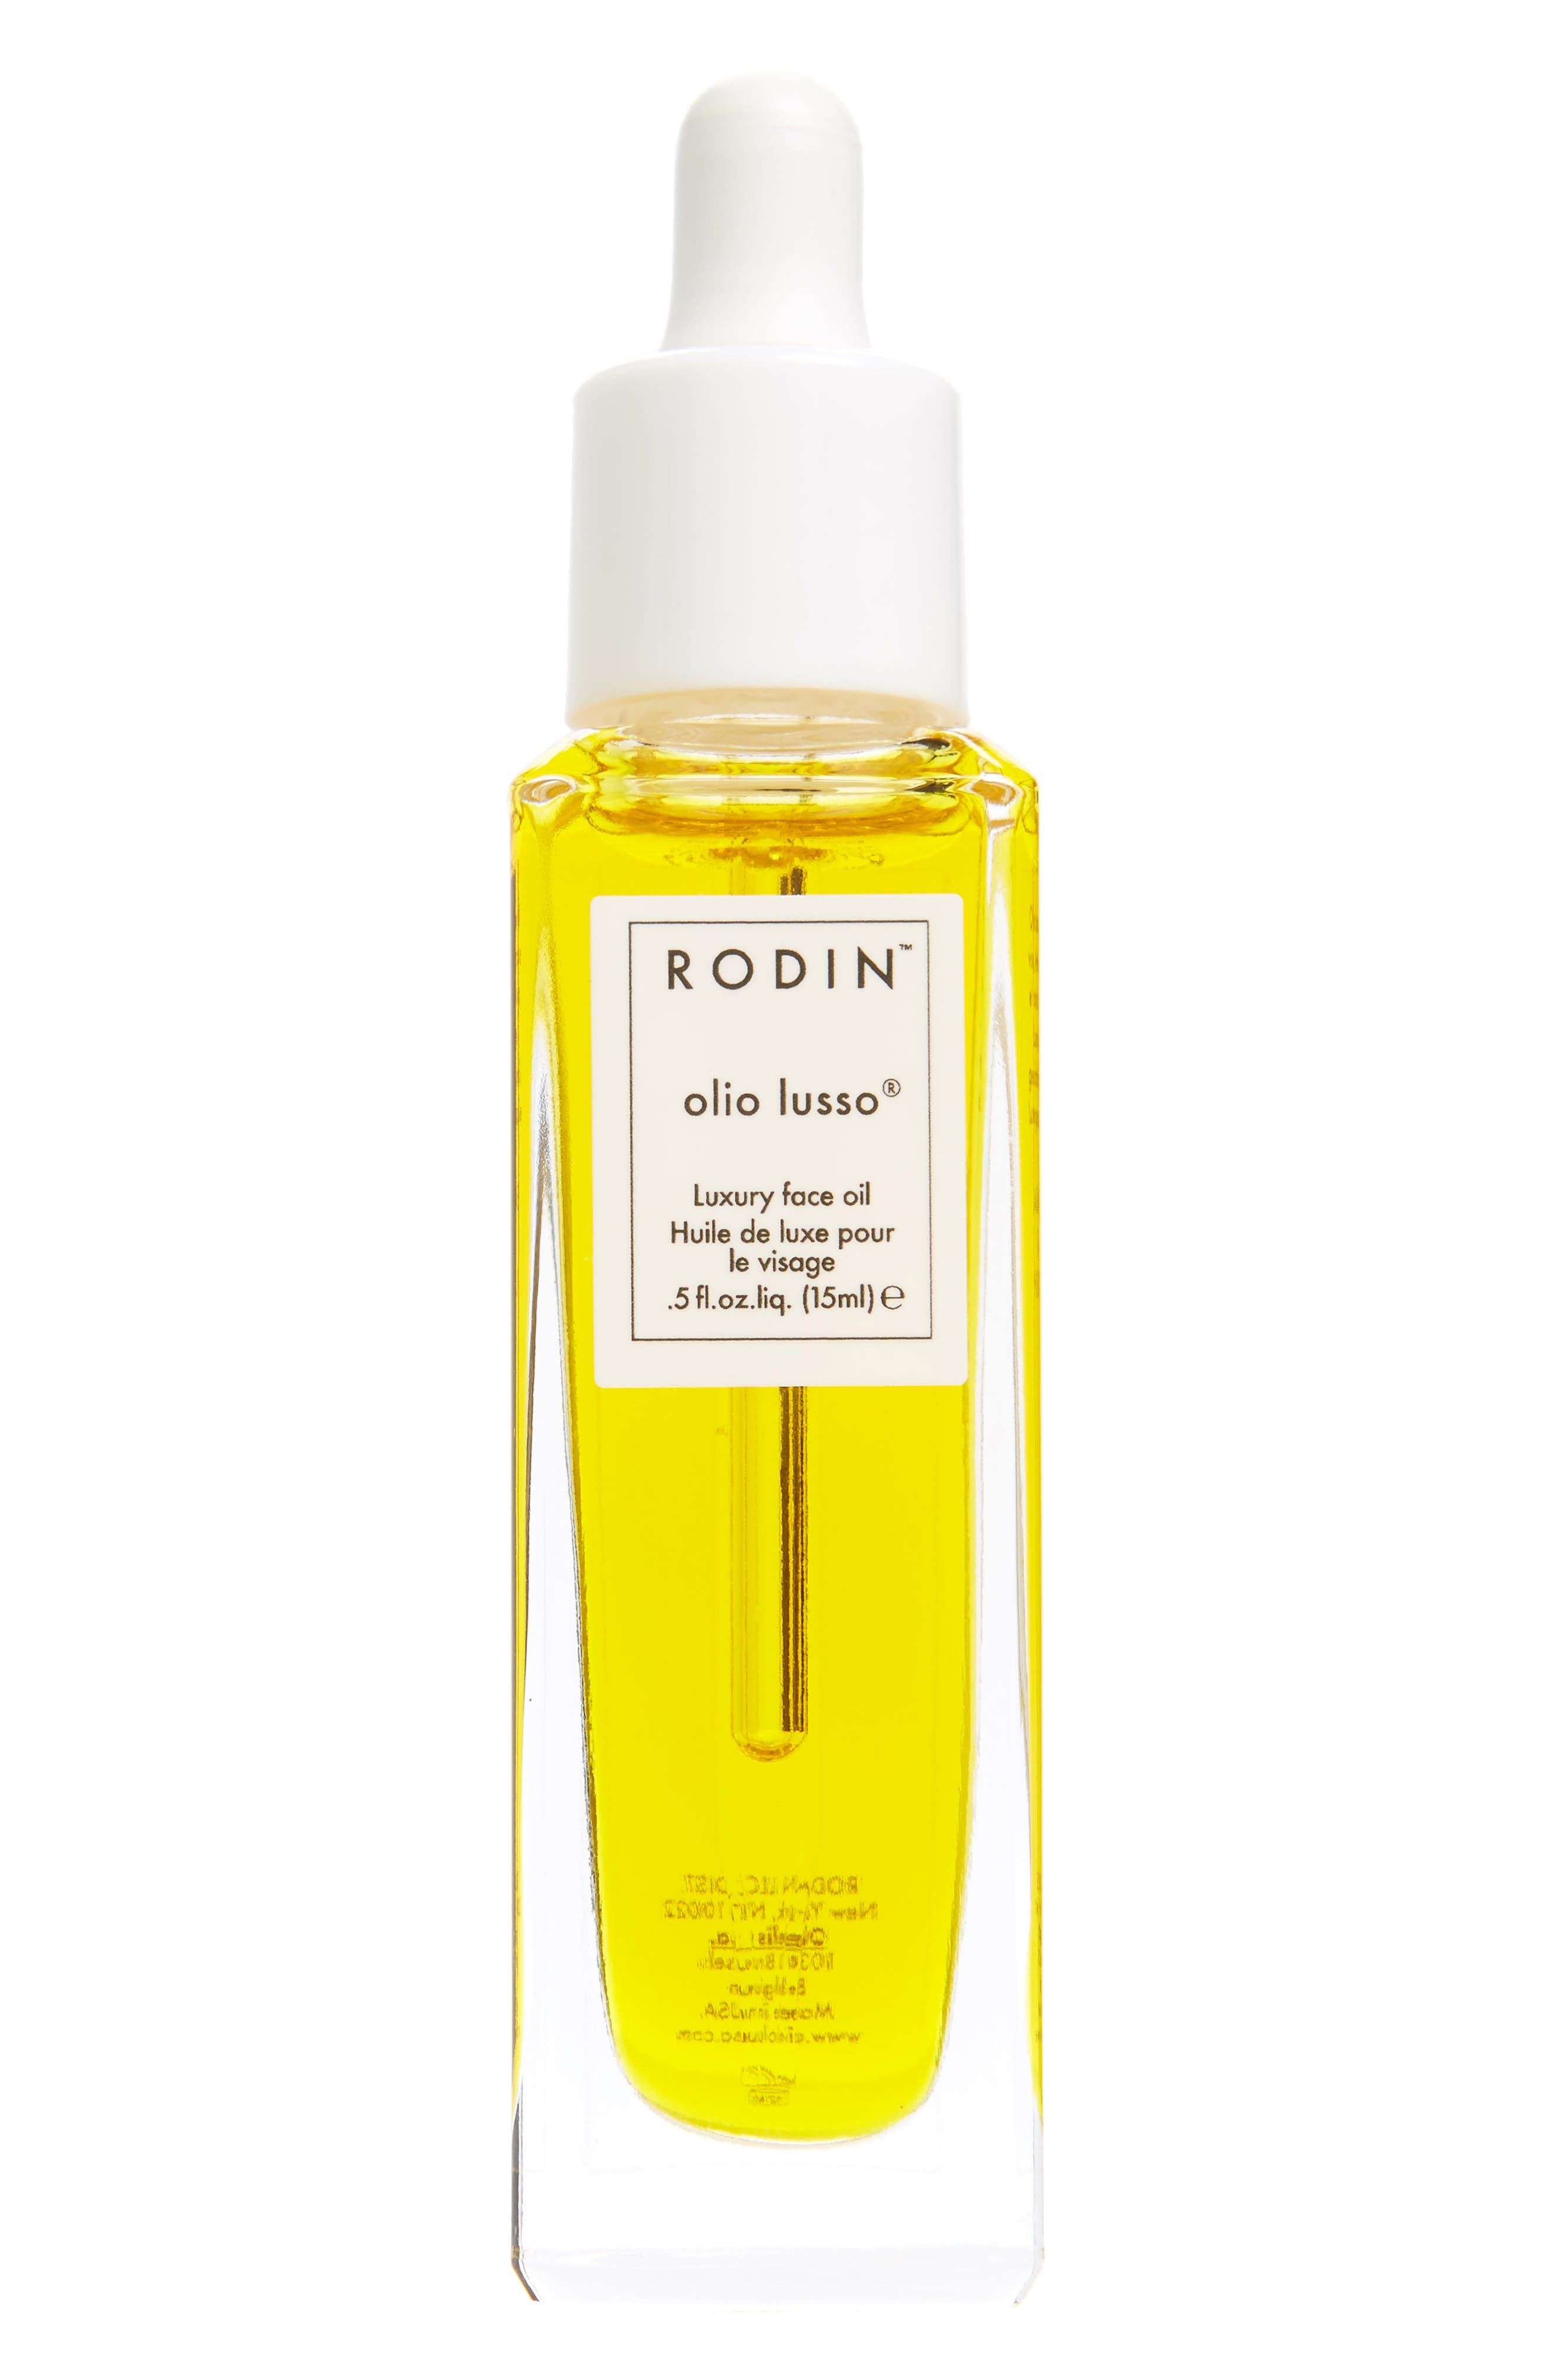 RODIN olio lusso Jasmine & Neroli Face Oil (Nordstrom Exclusive)